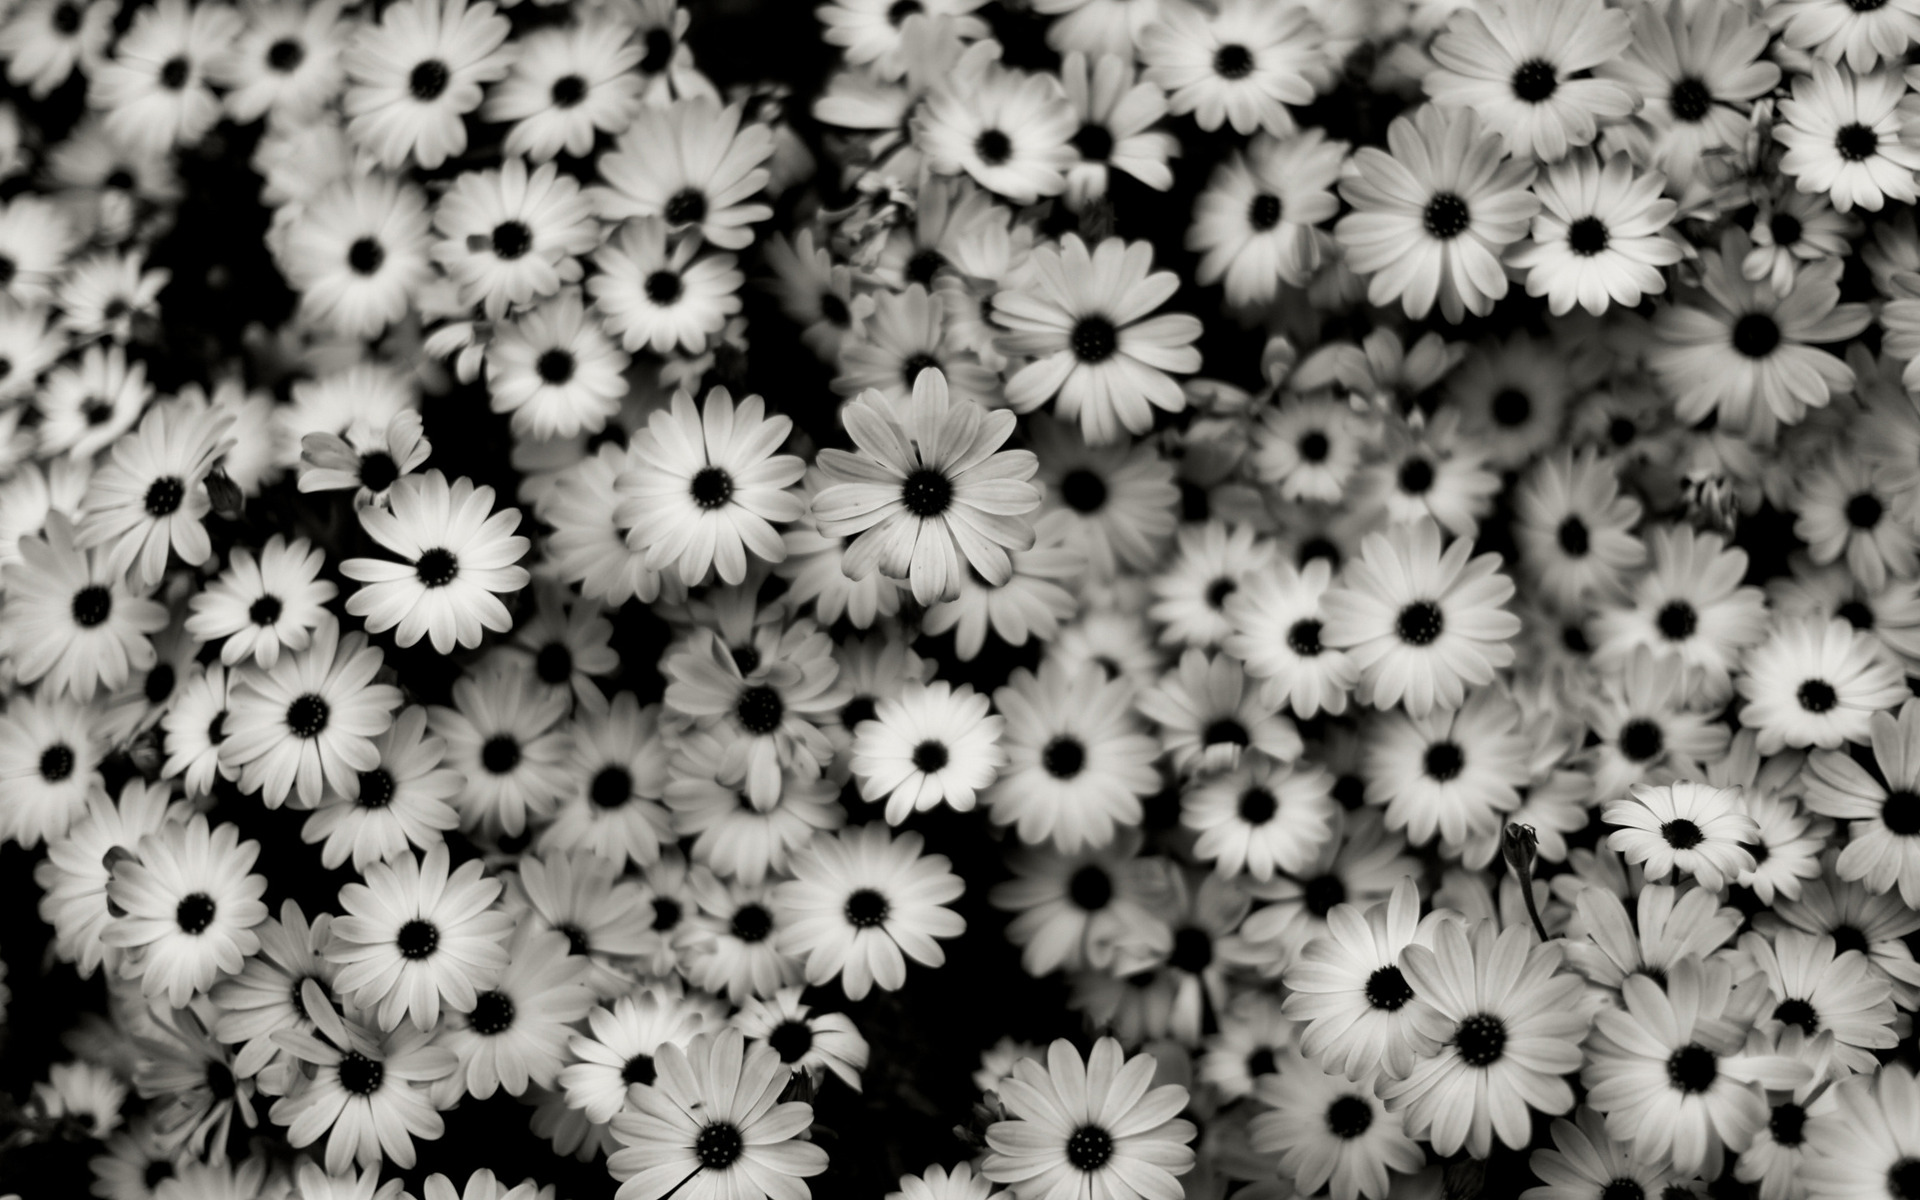 Black & White Background 2